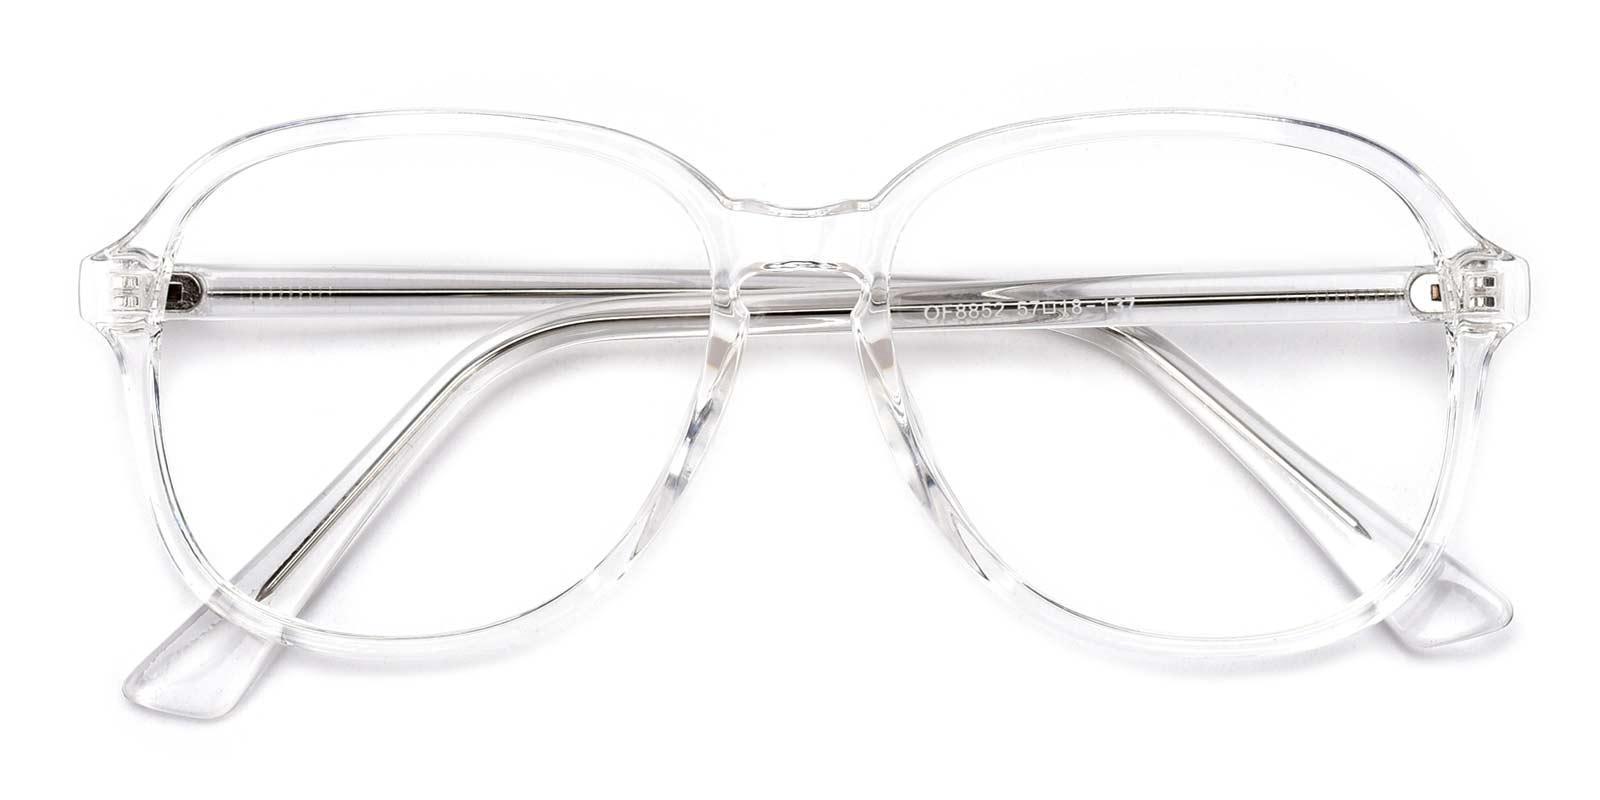 70s-Translucent-Square-TR-Eyeglasses-detail